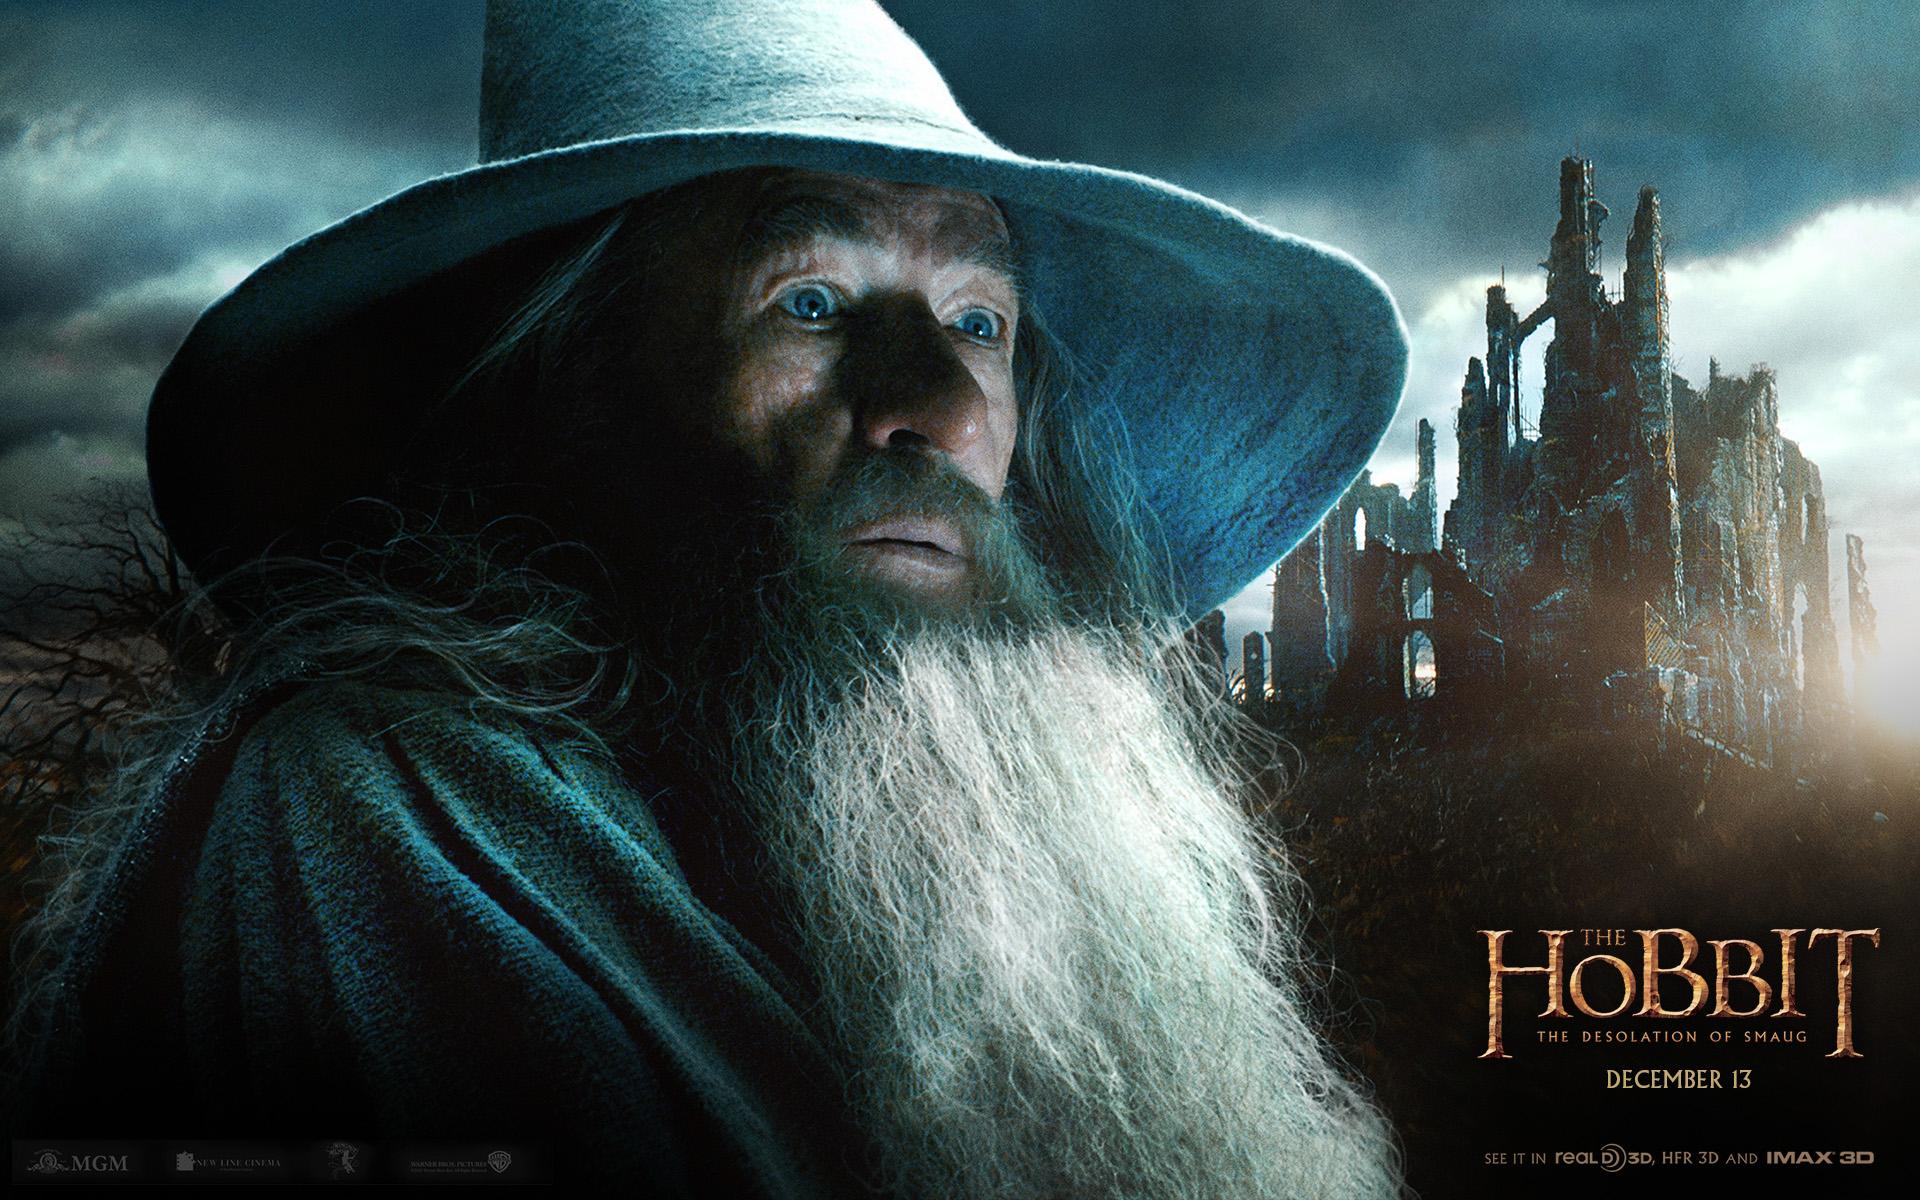 3d Live Wallpaper For Galaxy Y Ian Mckellen As Gandalf The Hobbit The Desolation Of